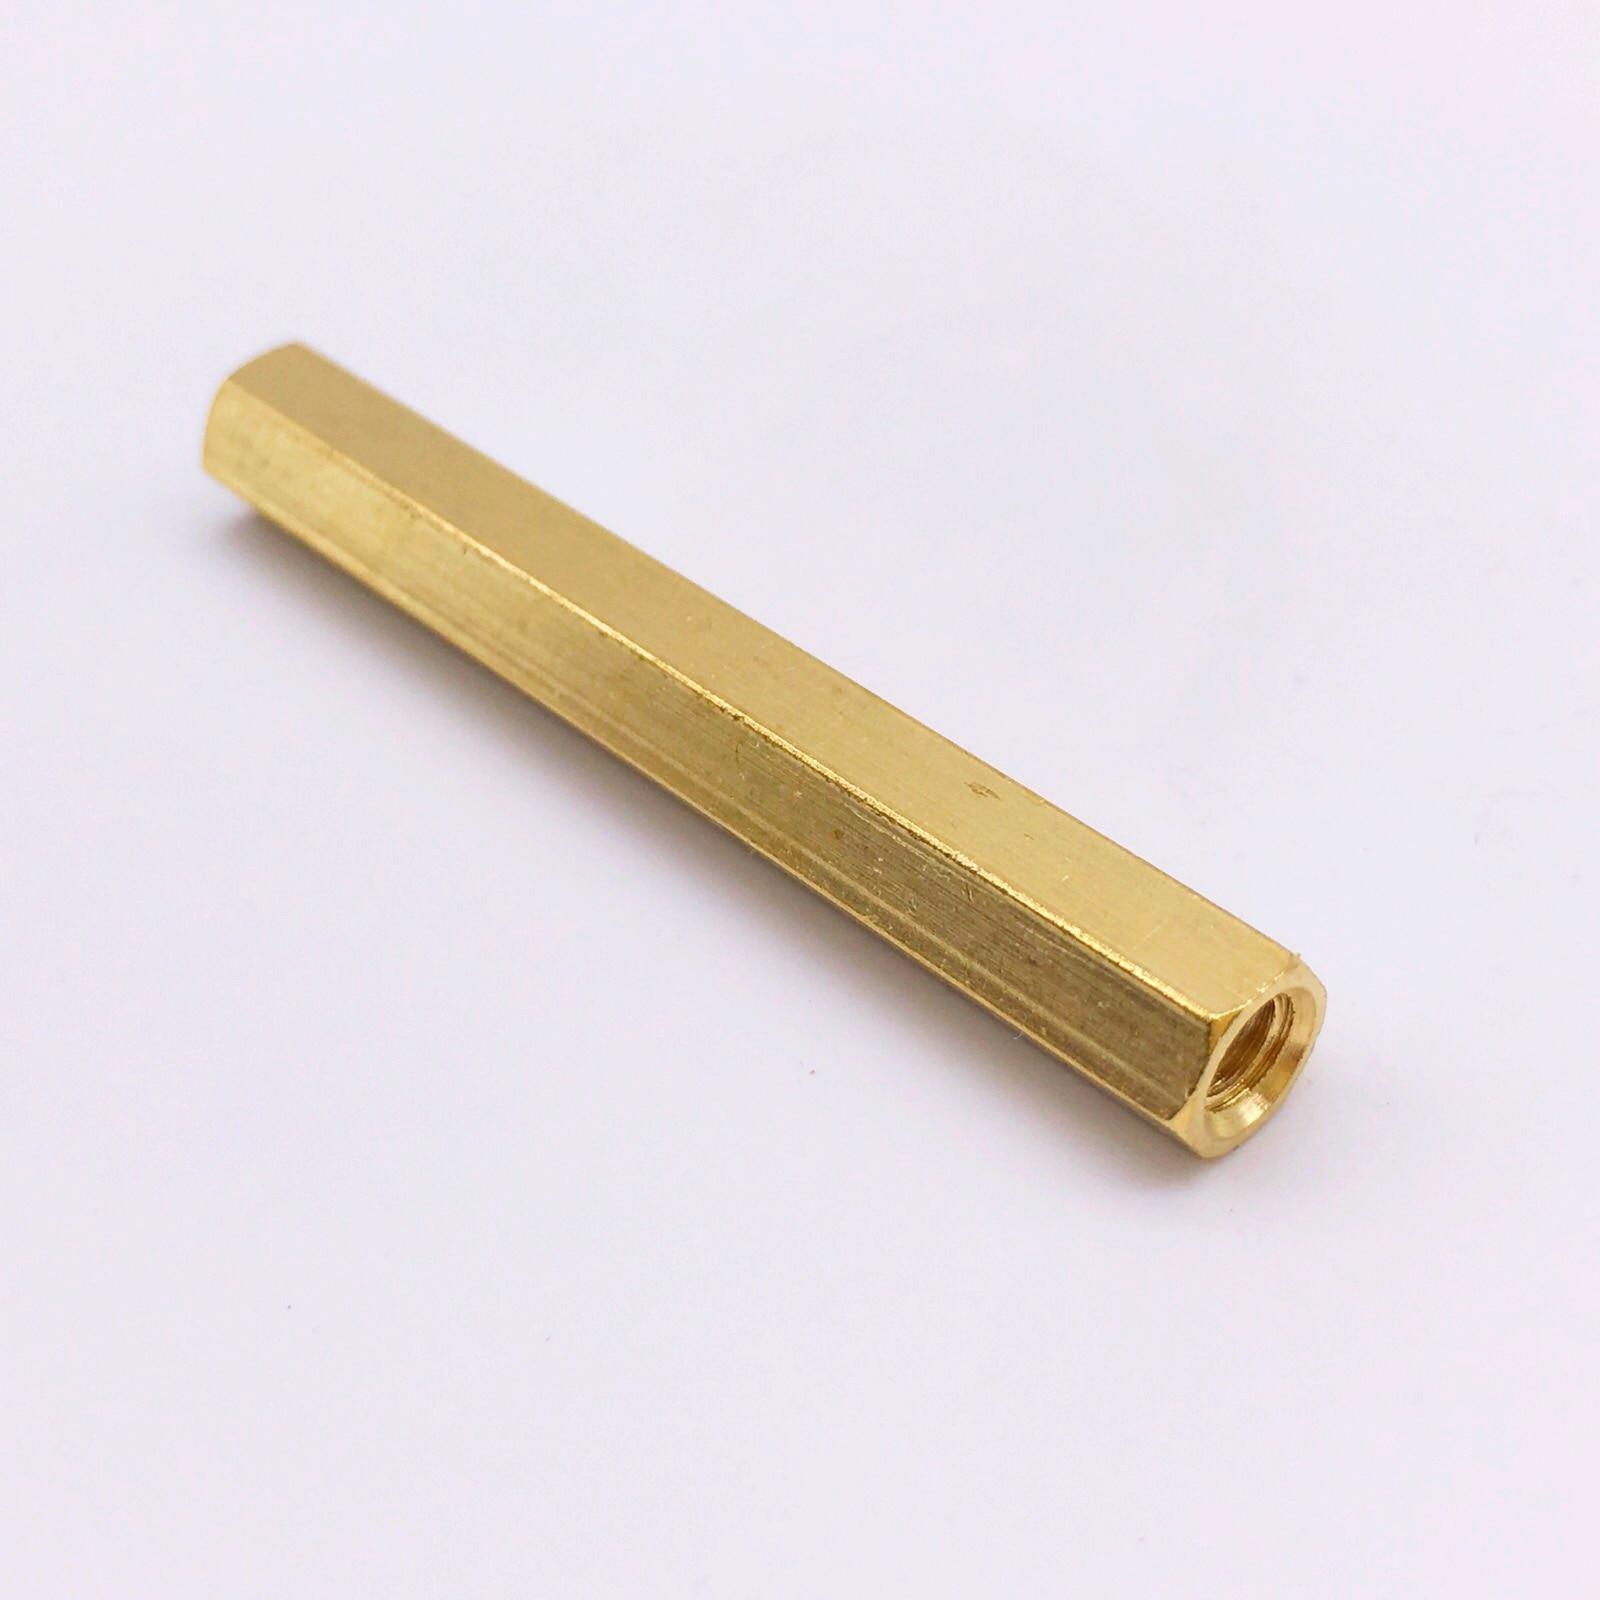 M5 Spacer Female Brass Nuts Hex PCB Standoff Threaded Pillar плавкий предохранитель roc 50 m5 spacer